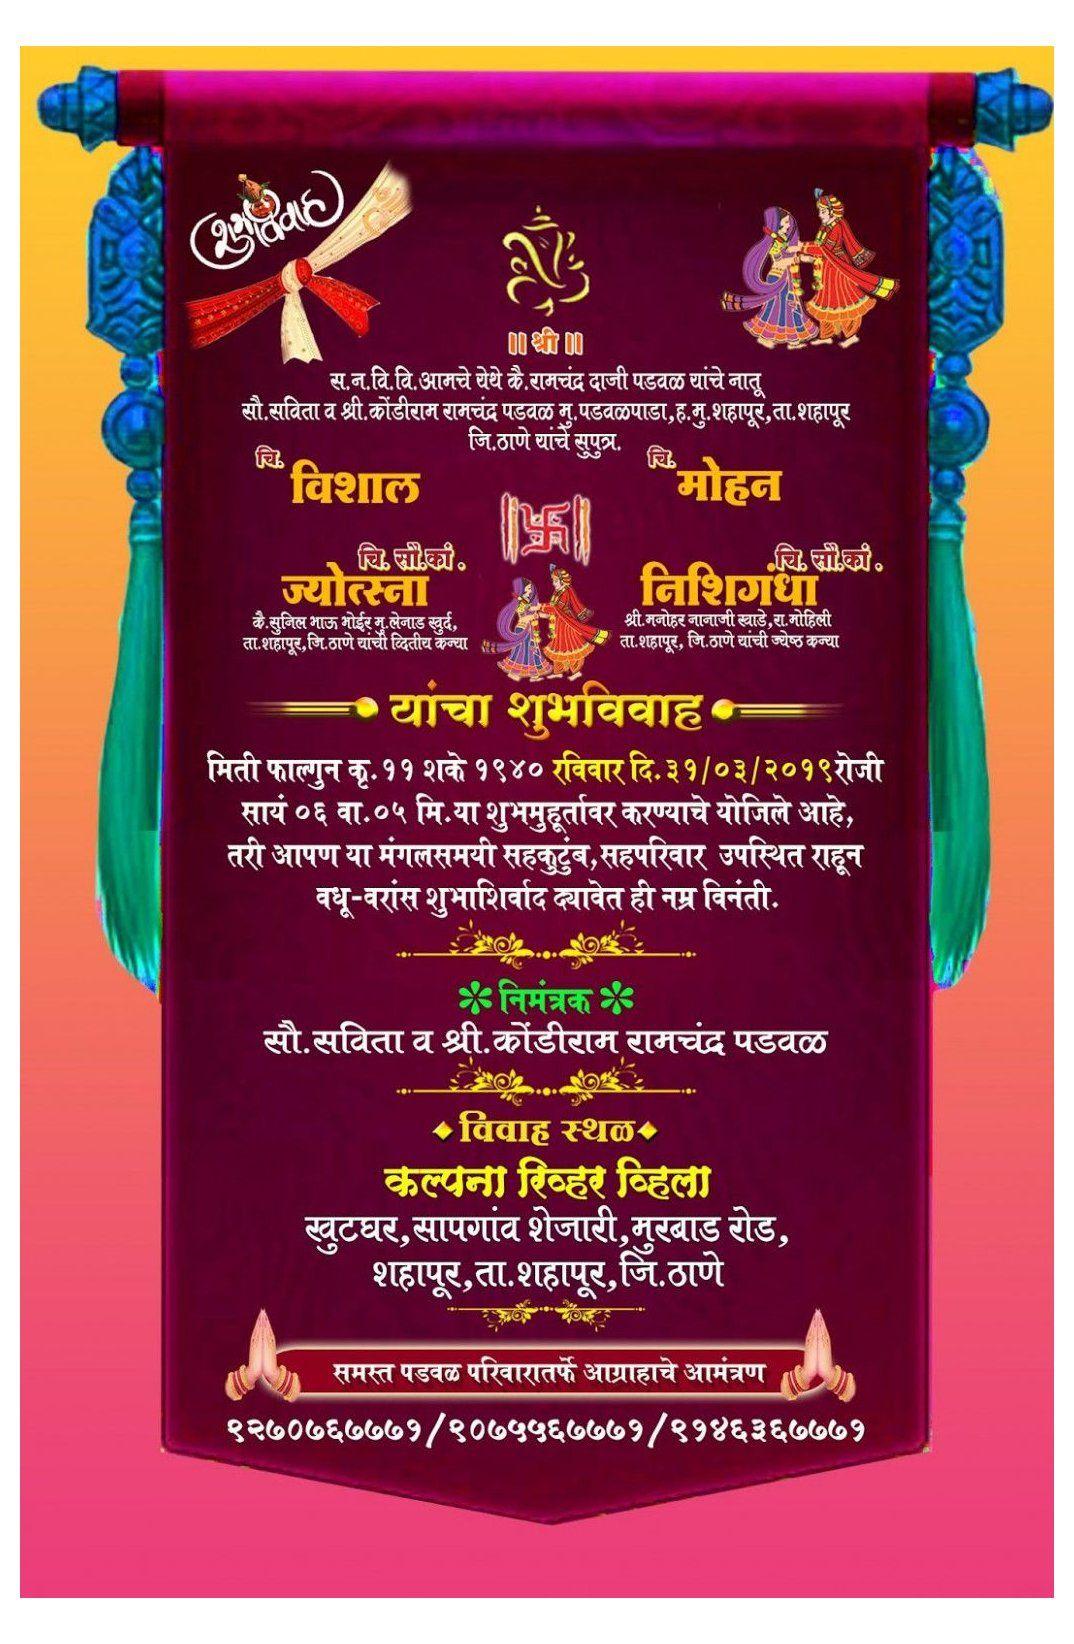 Card Wedding Wedding Card Format Card Wedding Marathi Card Wedding Marathi Delightful To Wedding Card Format Simple Wedding Cards Invitation Card Format